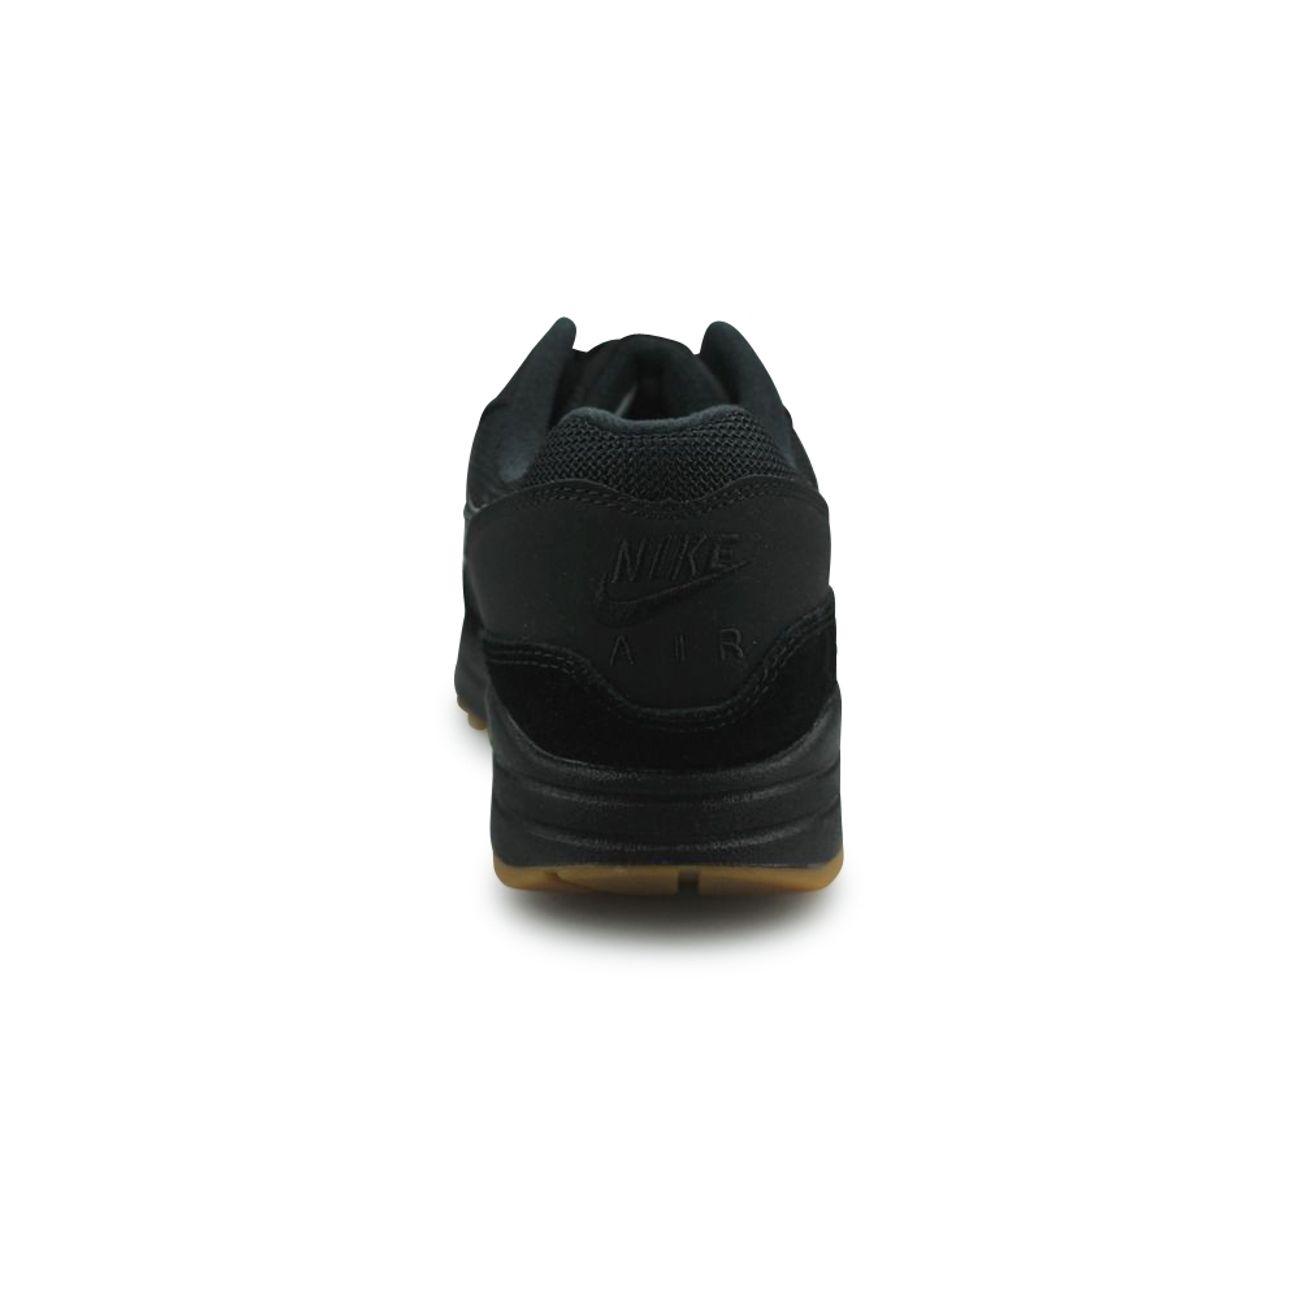 Basket Nike Nike Air Max 1 AH8145 007 Noir Achat Vente